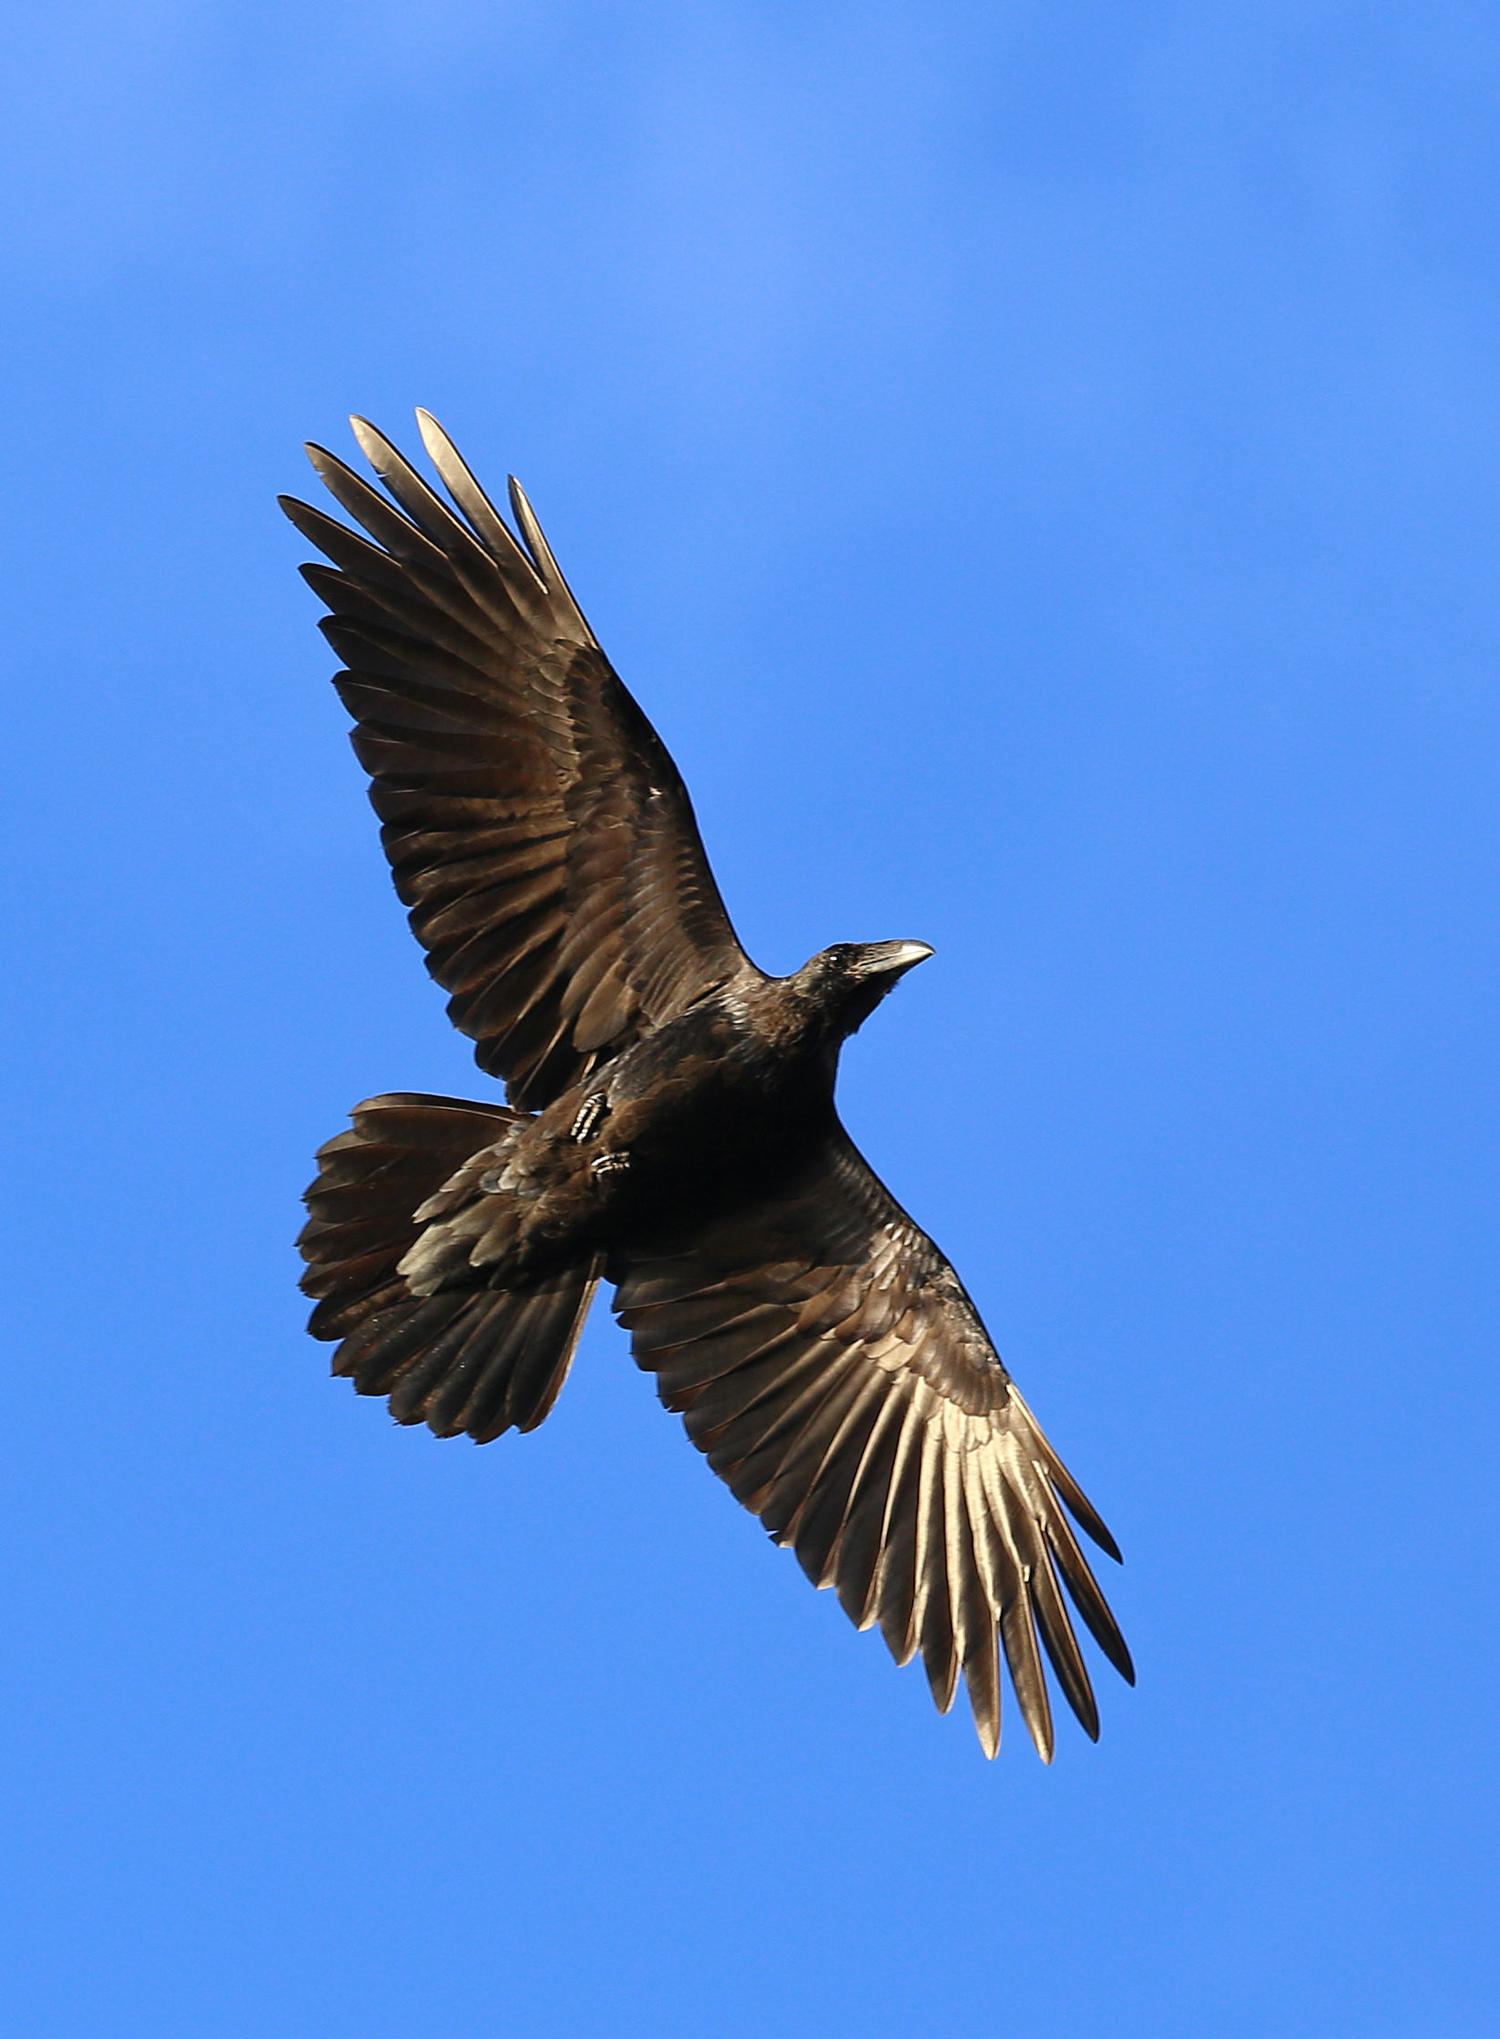 Raven in flight sun on wings beautiful gorgeous pretty corvid Corvus corax big black bird Southeast Alaska flying wingspan